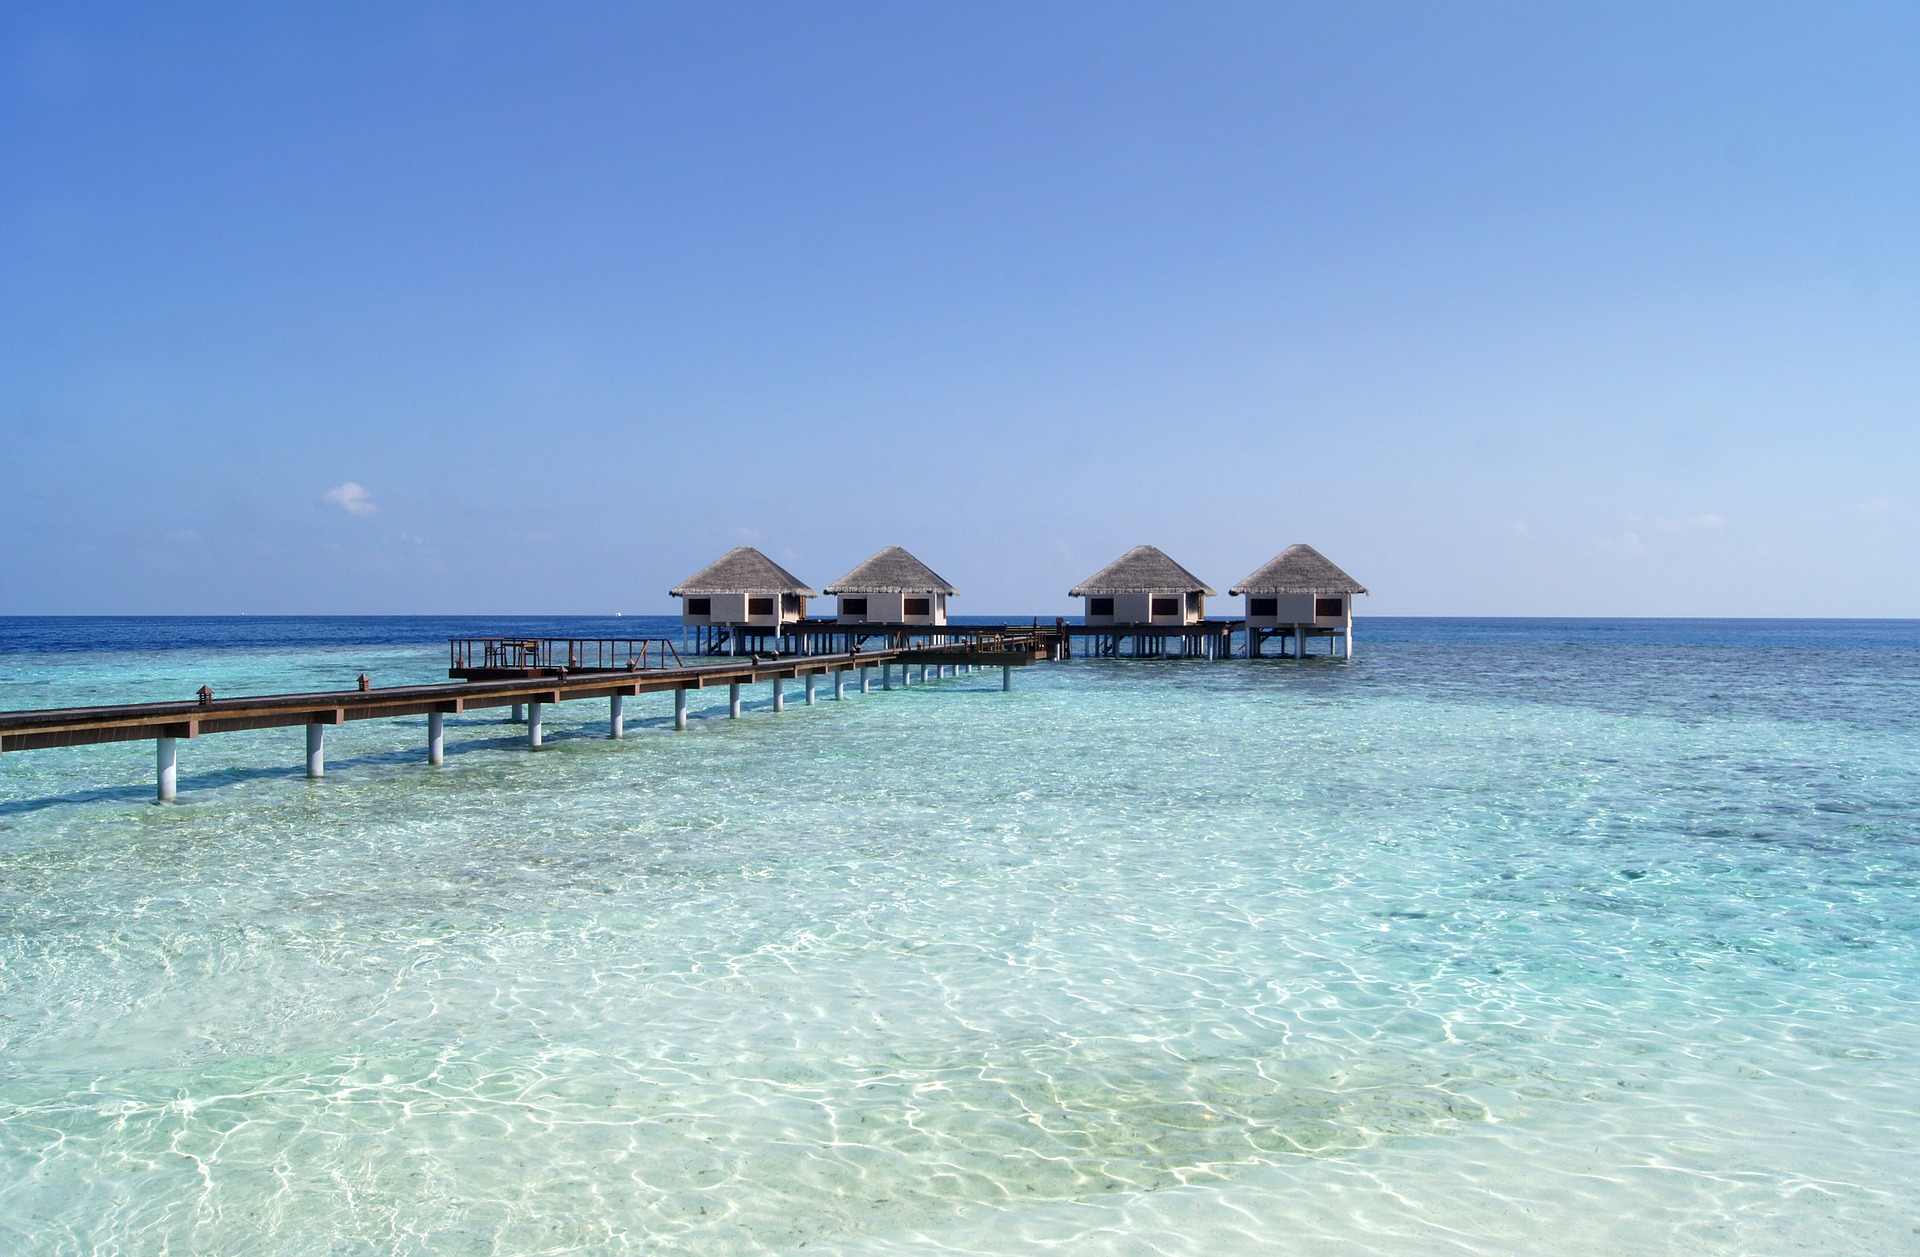 maldives-2190384_1920